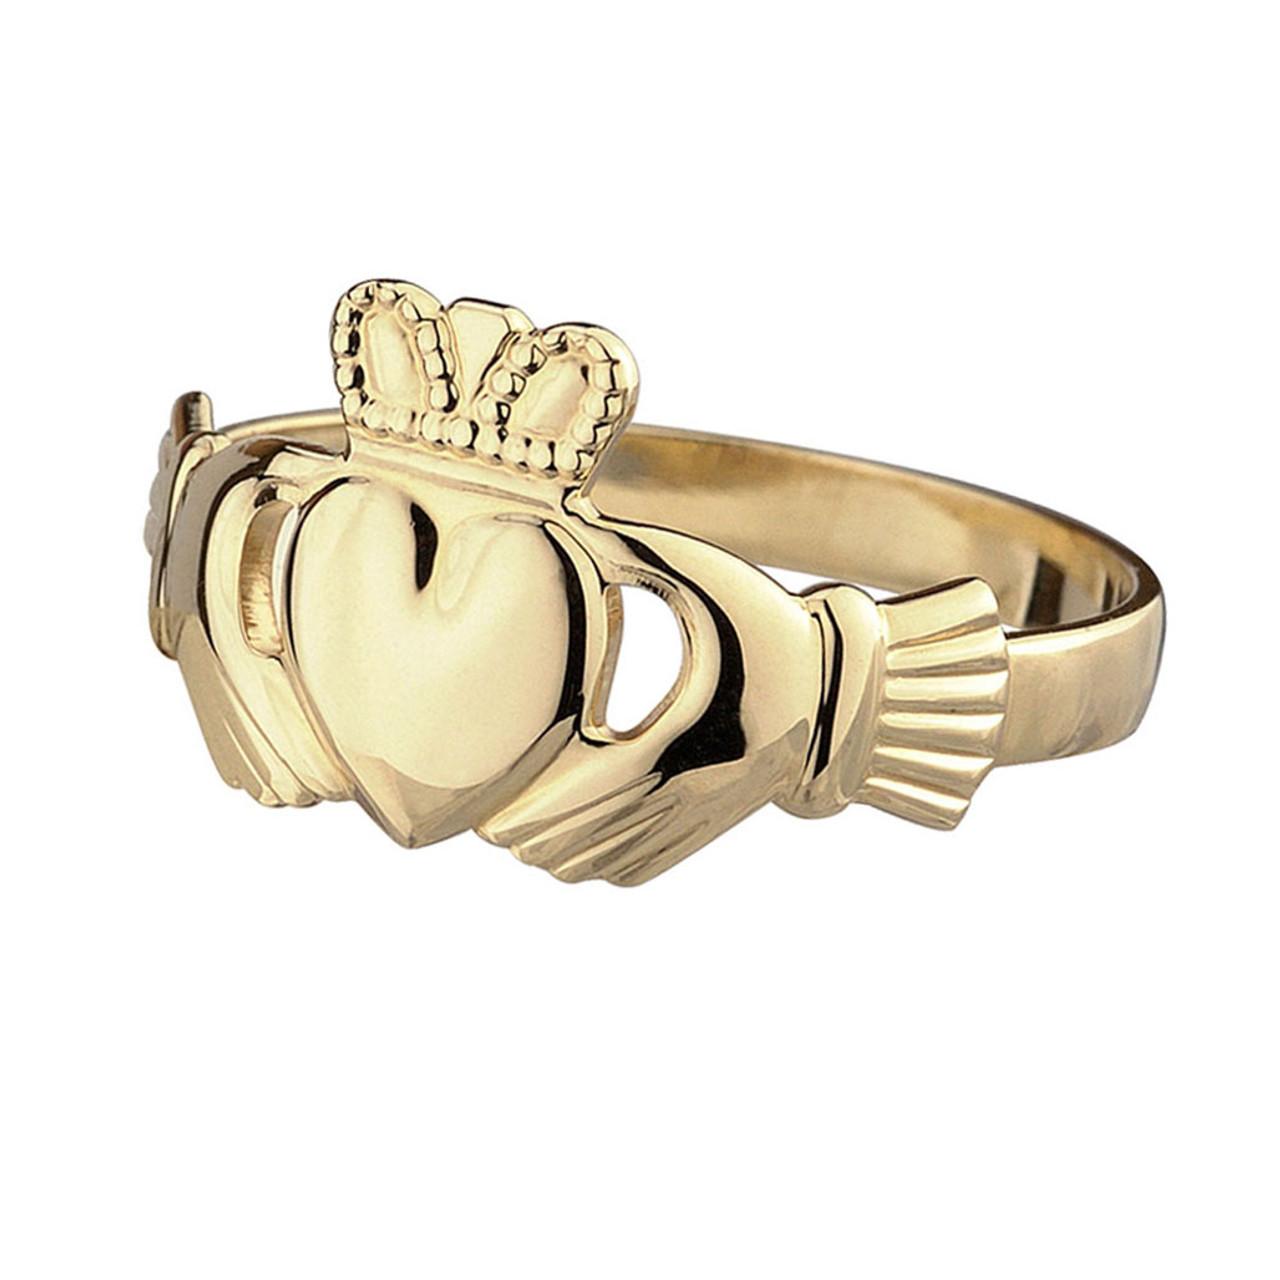 10KT Gold Claddagh Ring Female